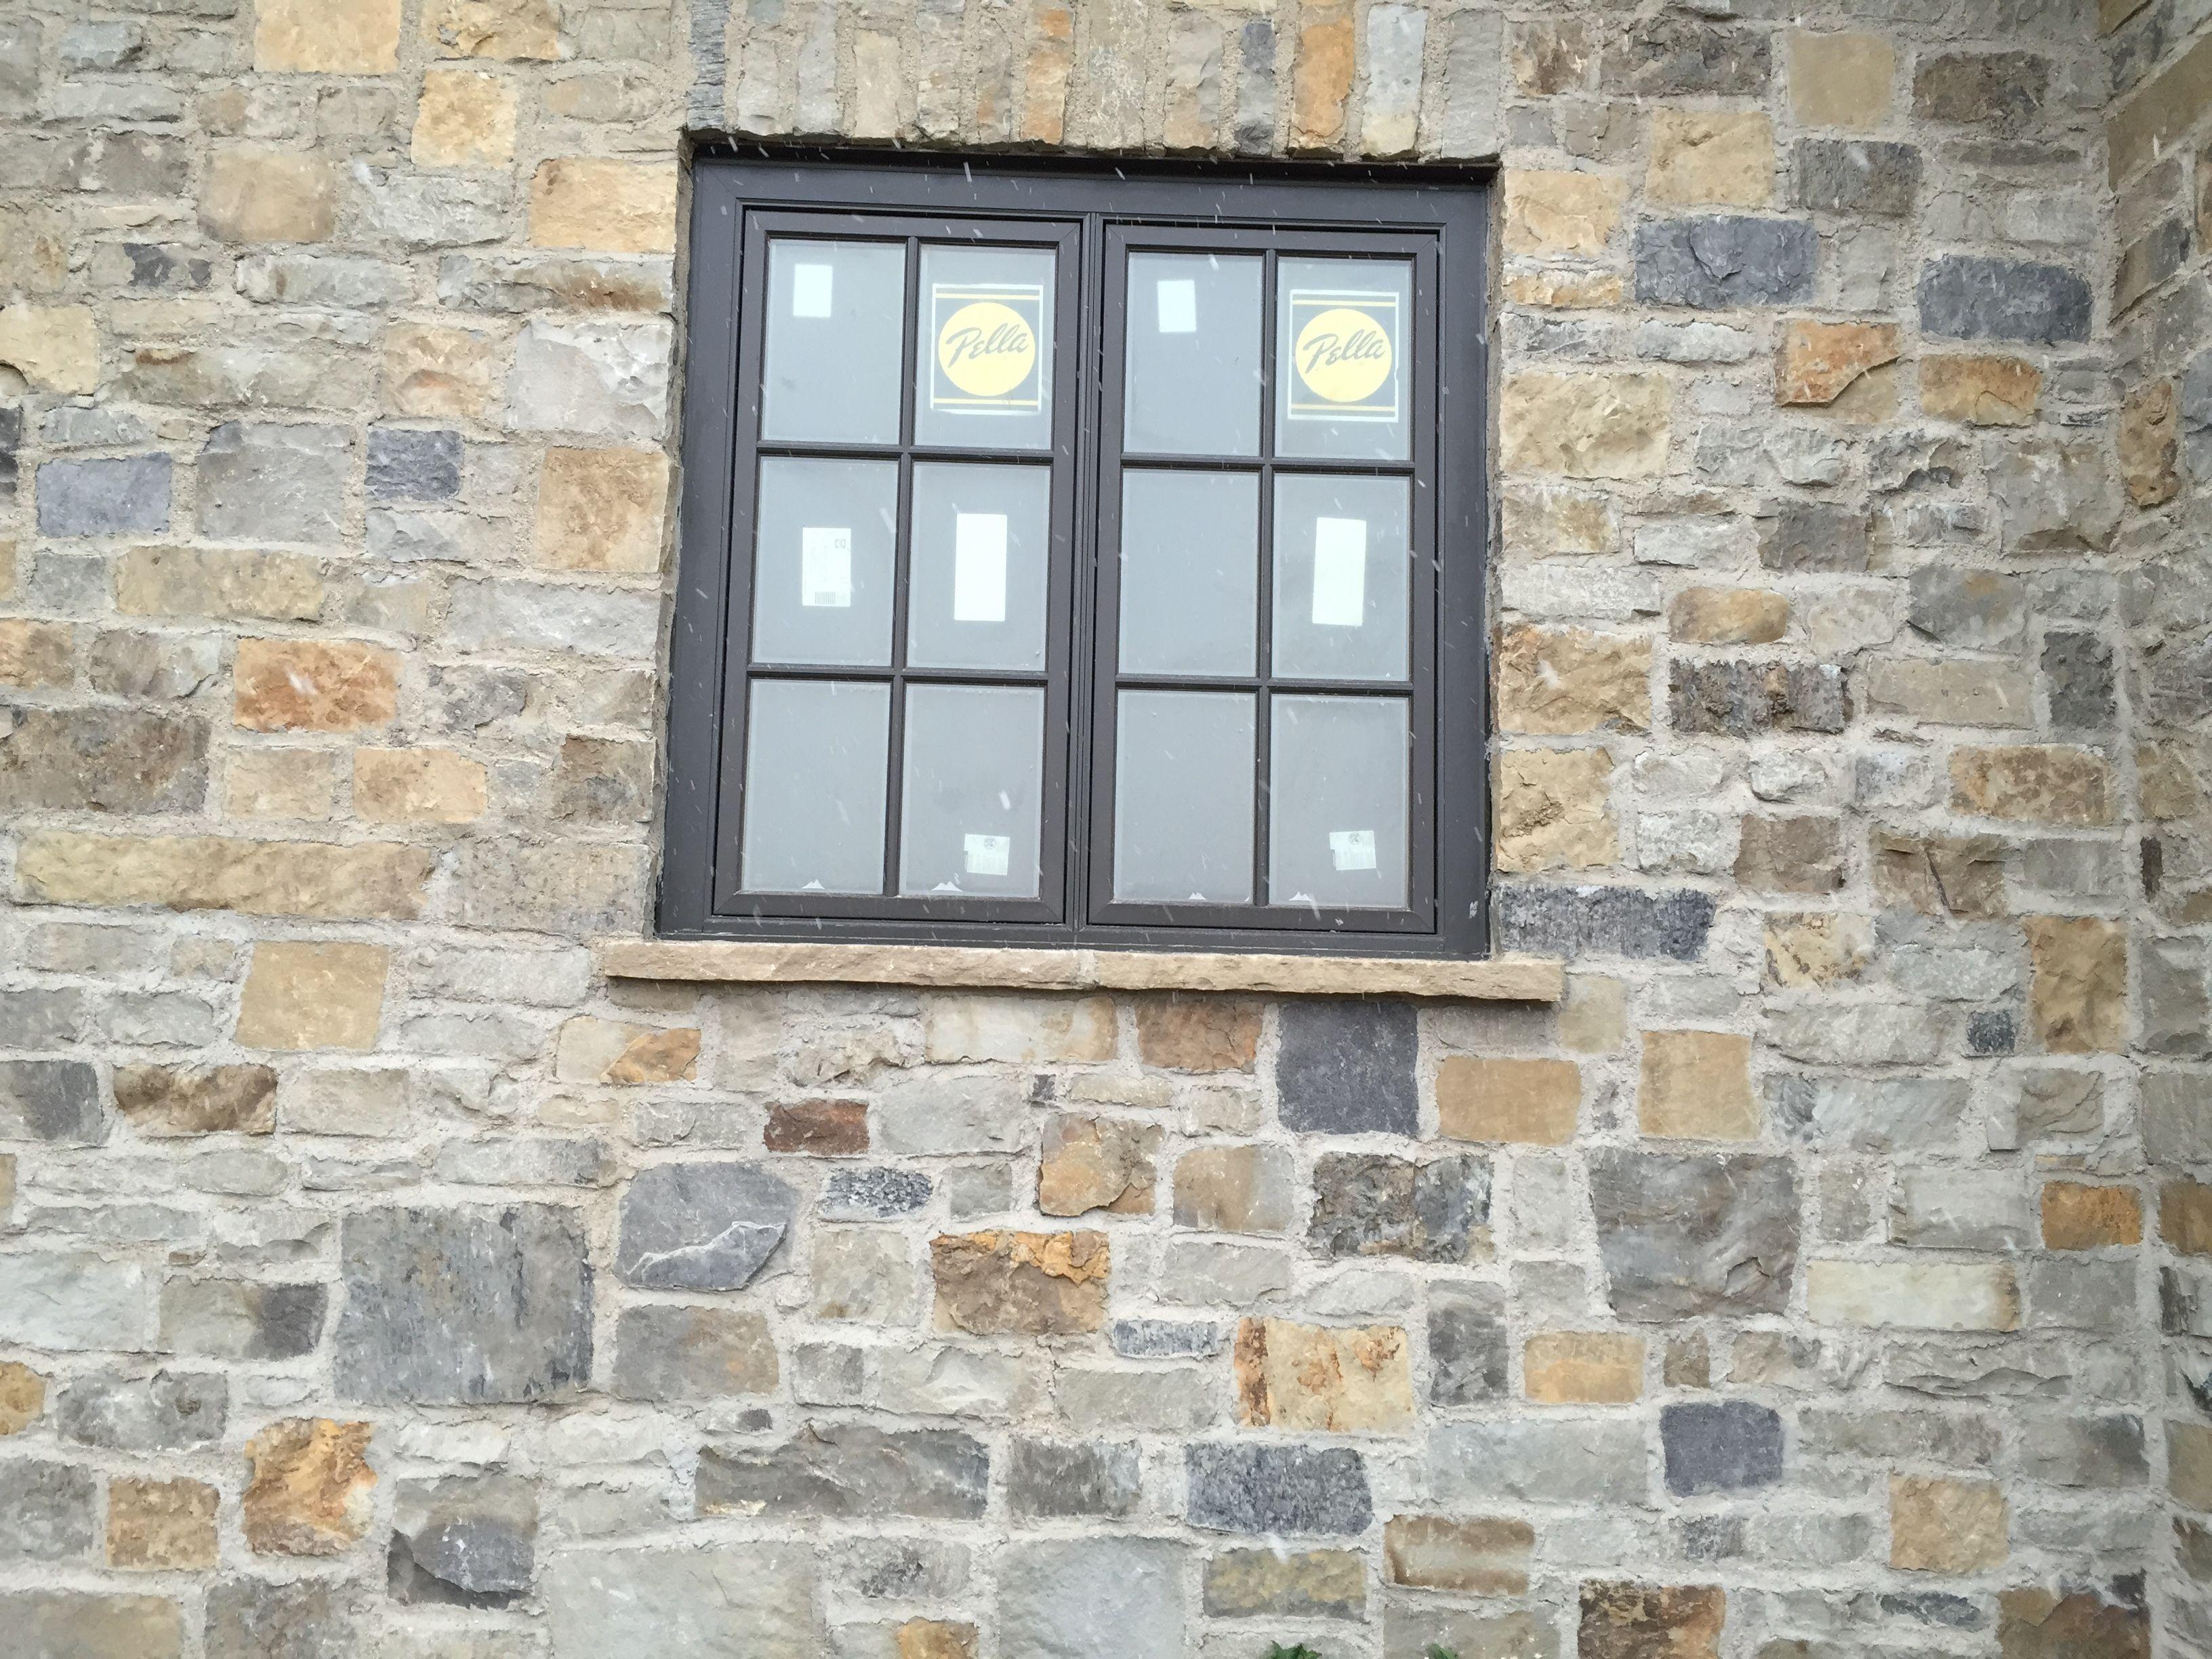 Brick and stone stone veneer stone wall